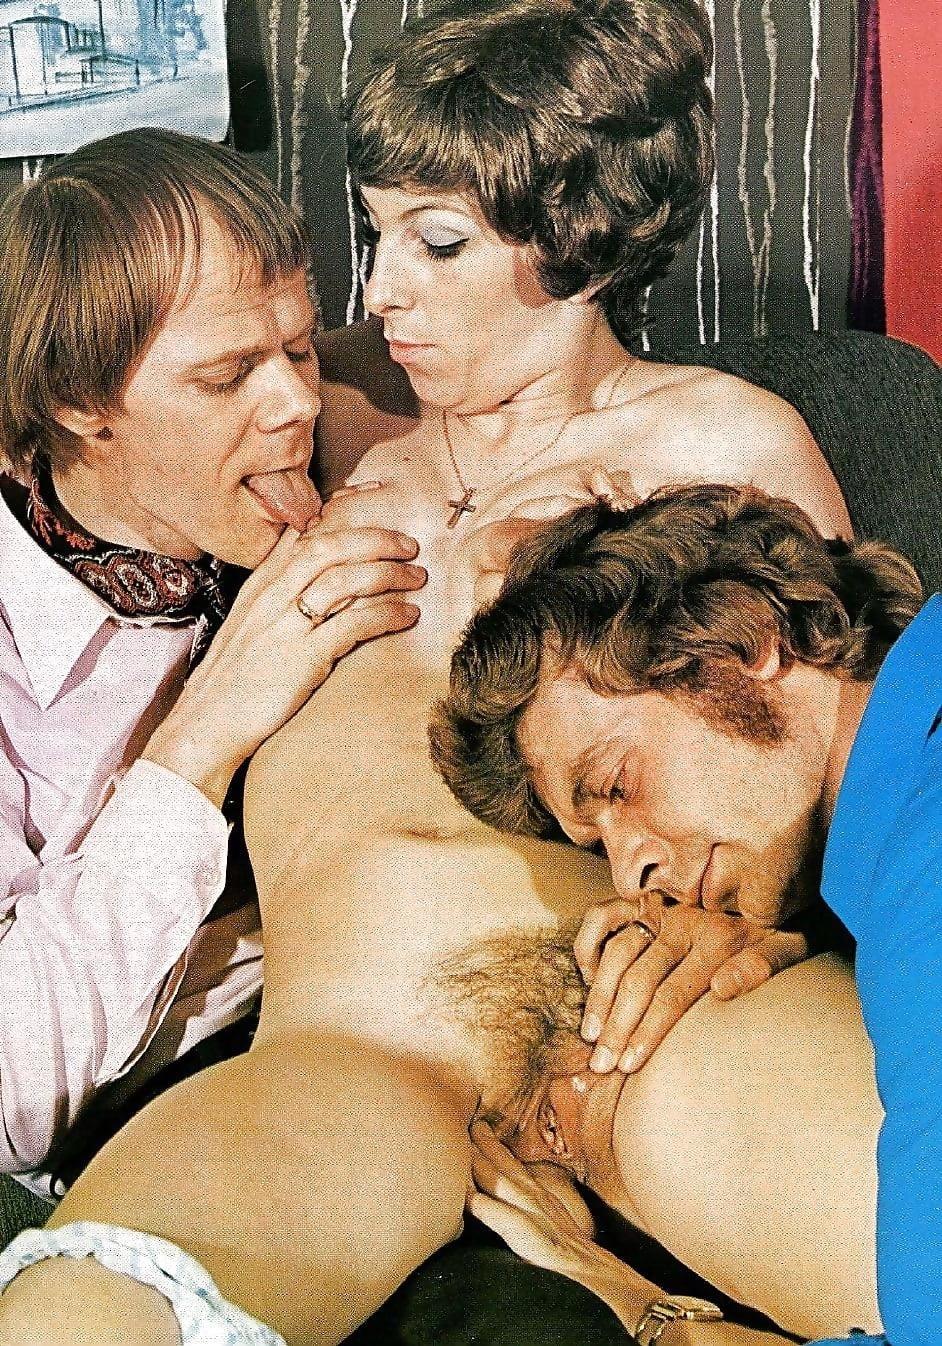 Porn threesome amateur-5256